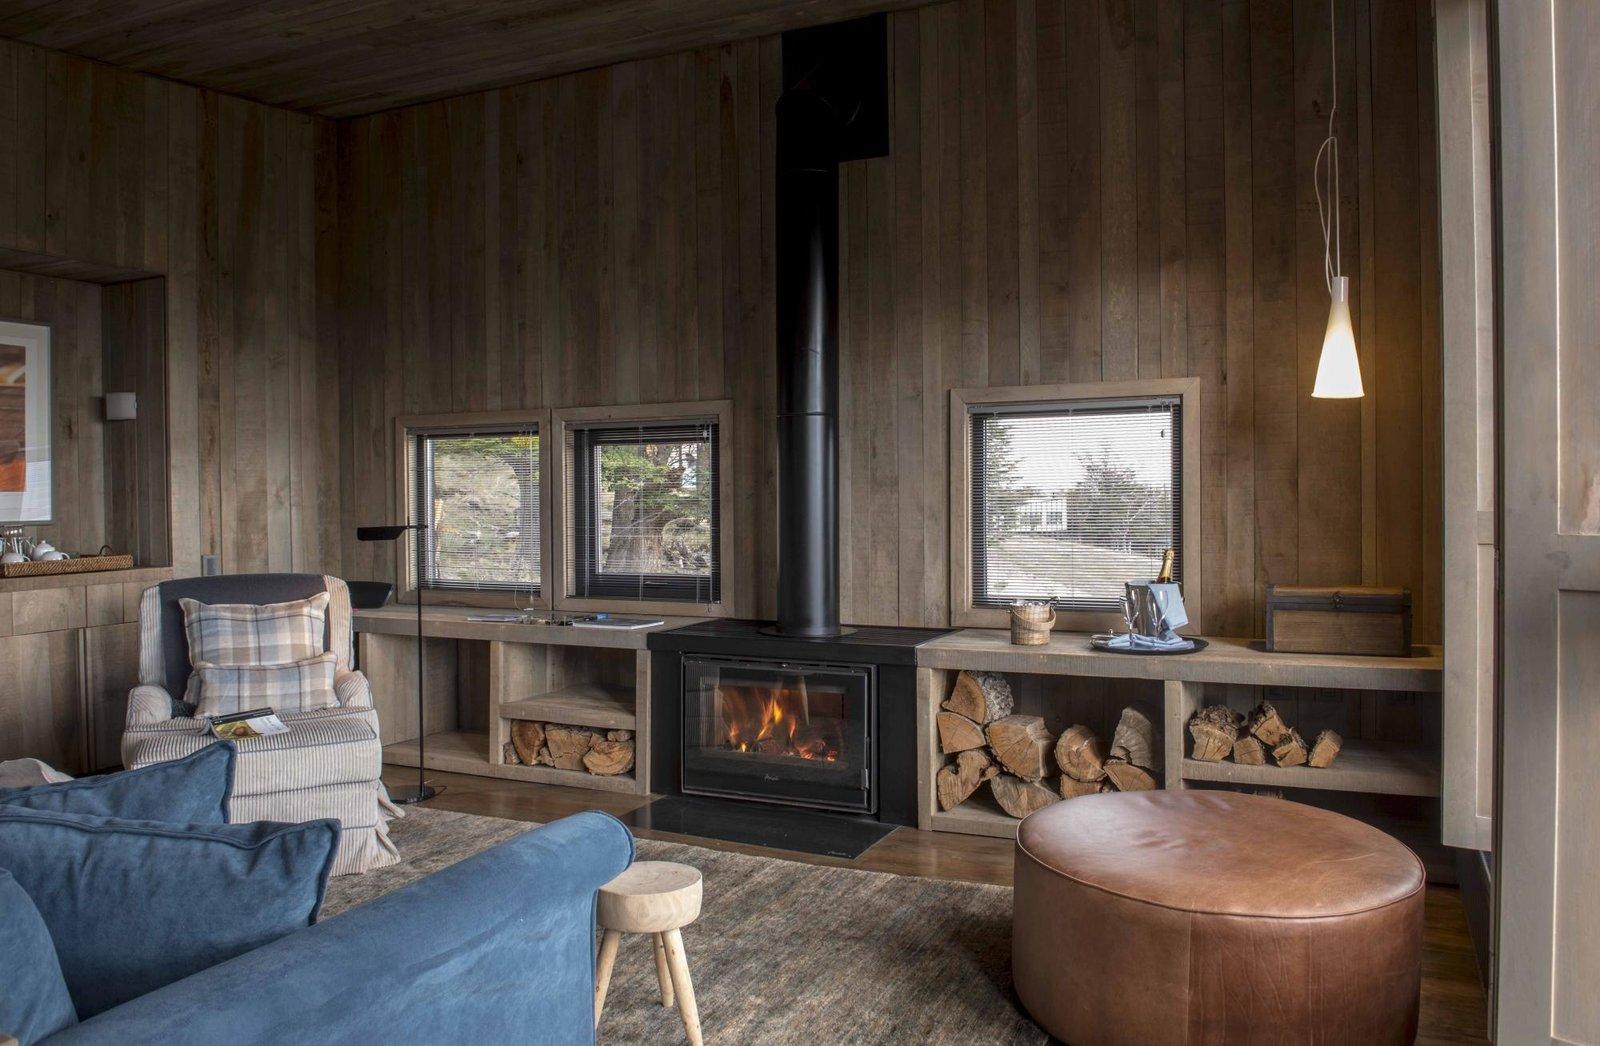 Living Room, Wood Burning Fireplace, Floor Lighting, Medium Hardwood Floor, Pendant Lighting, Rug Floor, Chair, and Sofa  Awasi Patagonia